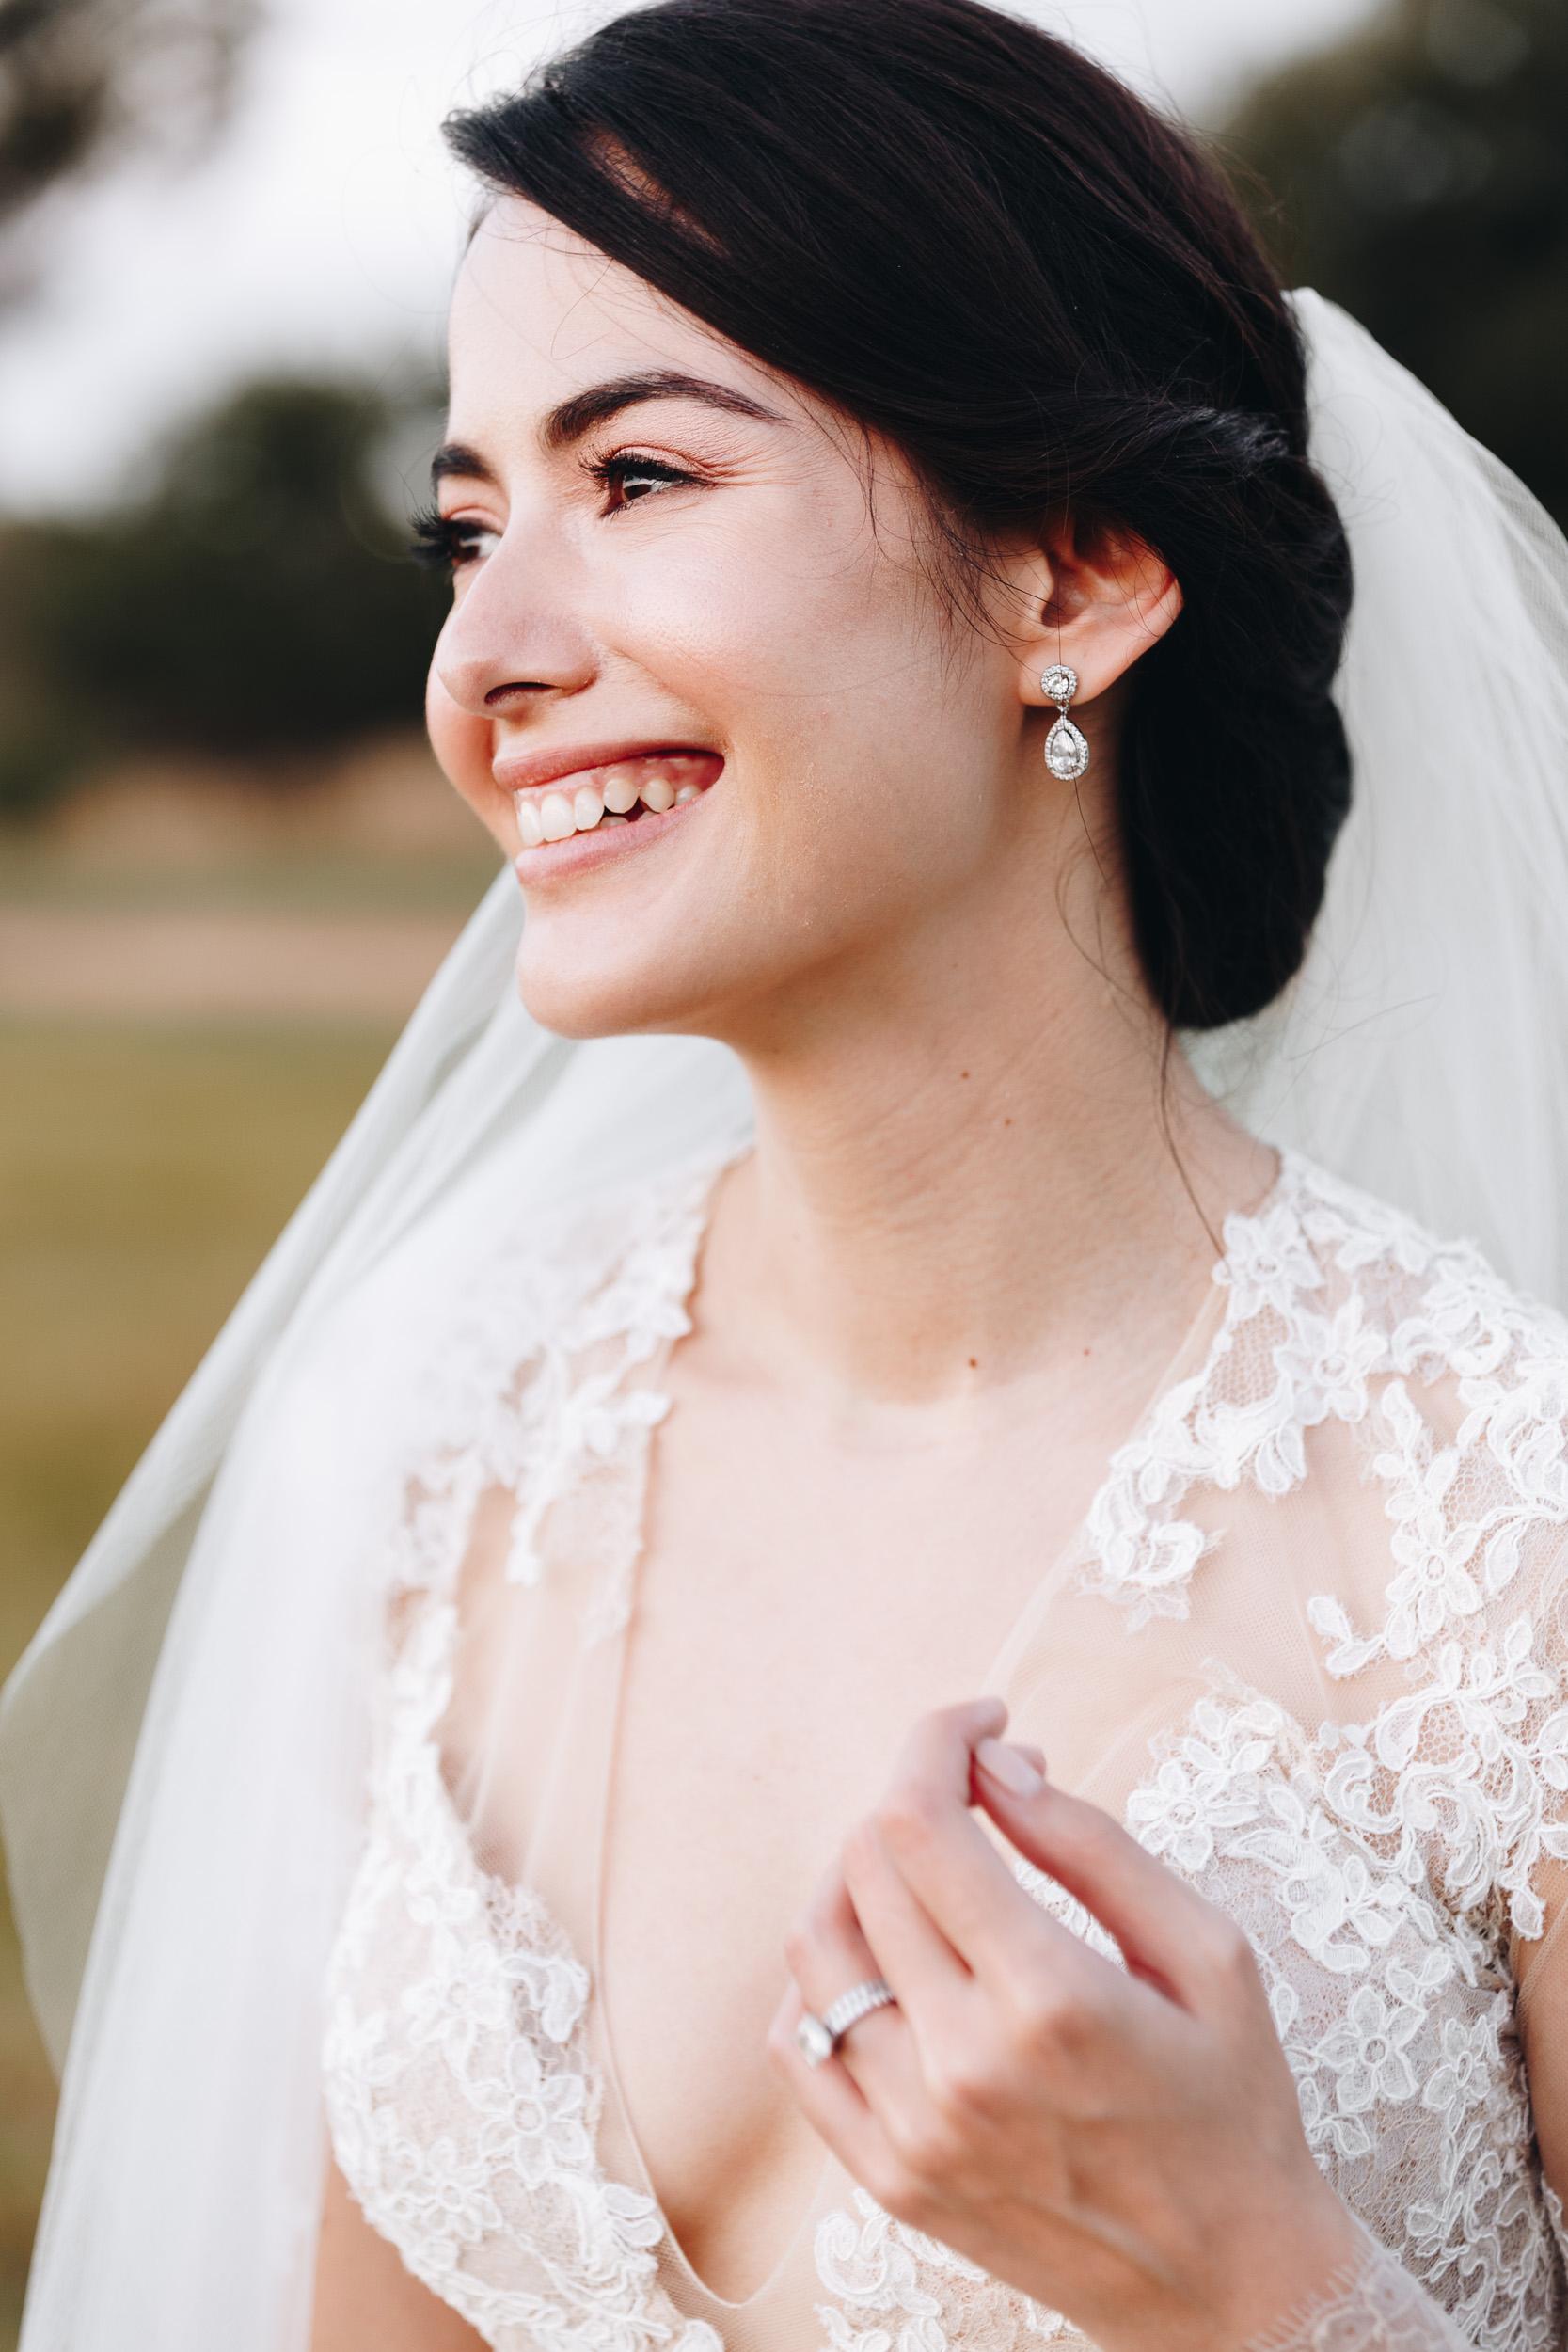 Jenny-Rockett-John-Scranton-Cape-Town-Wedding-Photographer-Andrea-Kellan-194.jpg